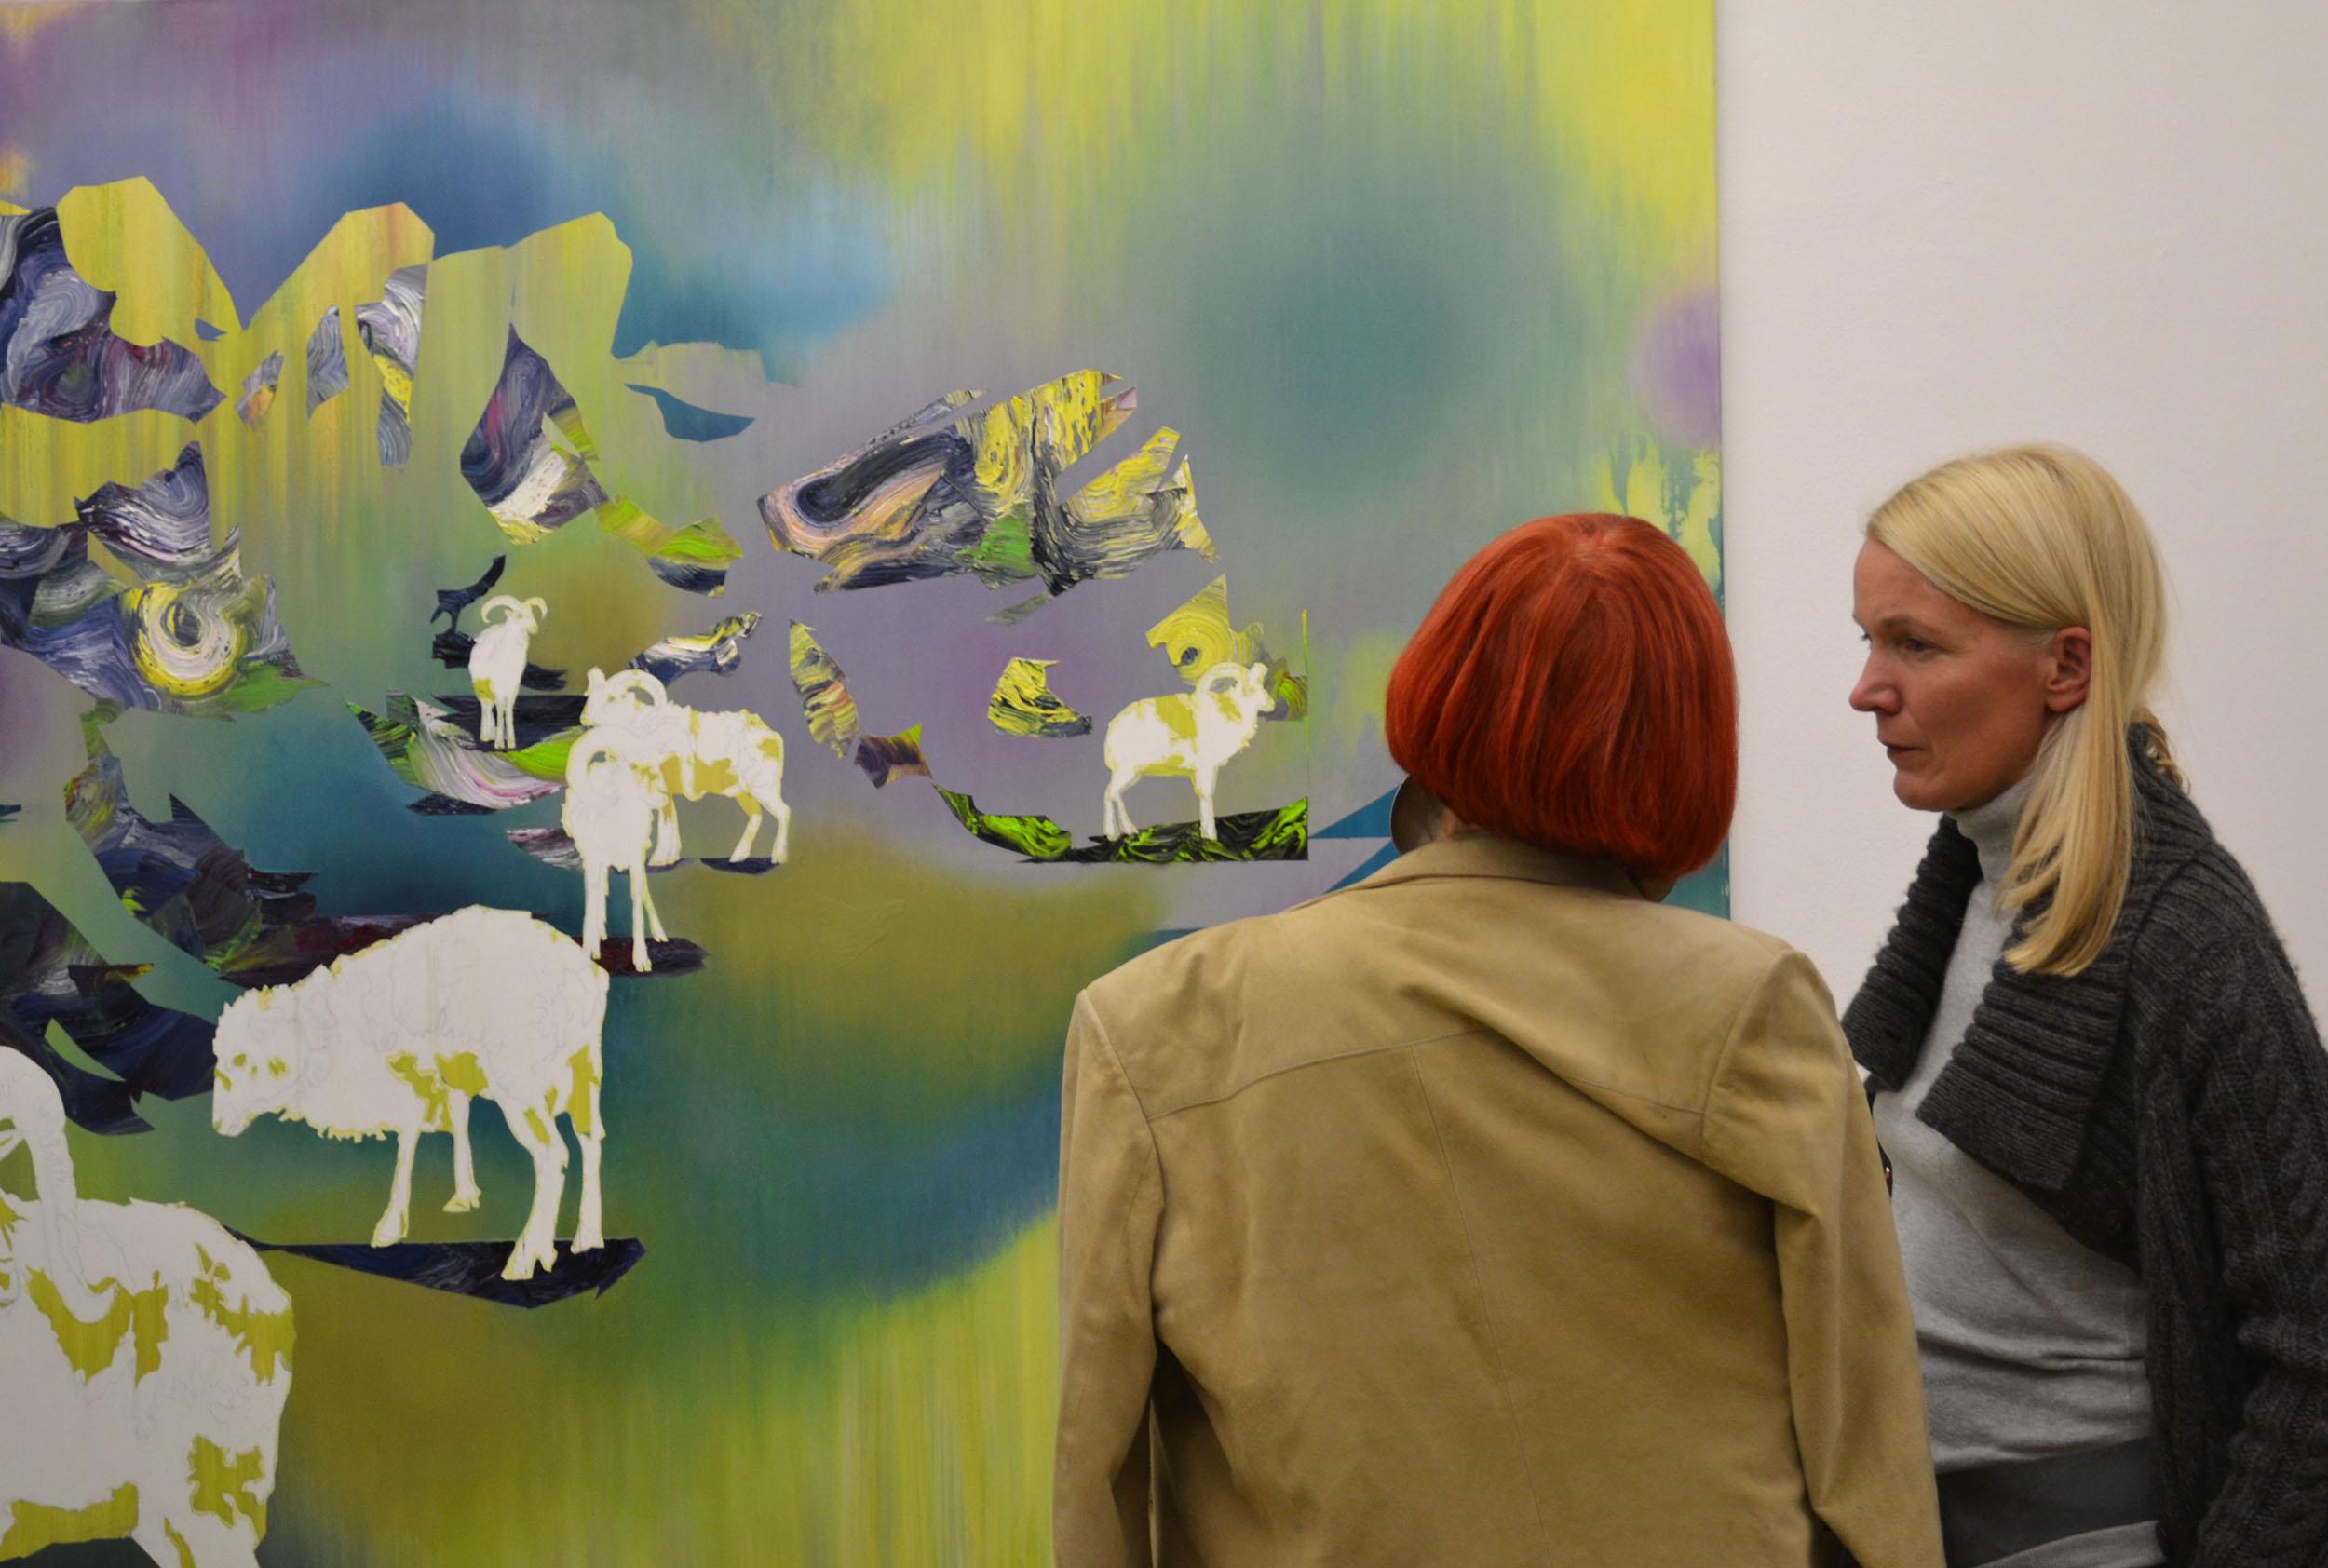 Matthias Moravek, %22Gran Paradiso%22, exhibition view5, 2011.jpg